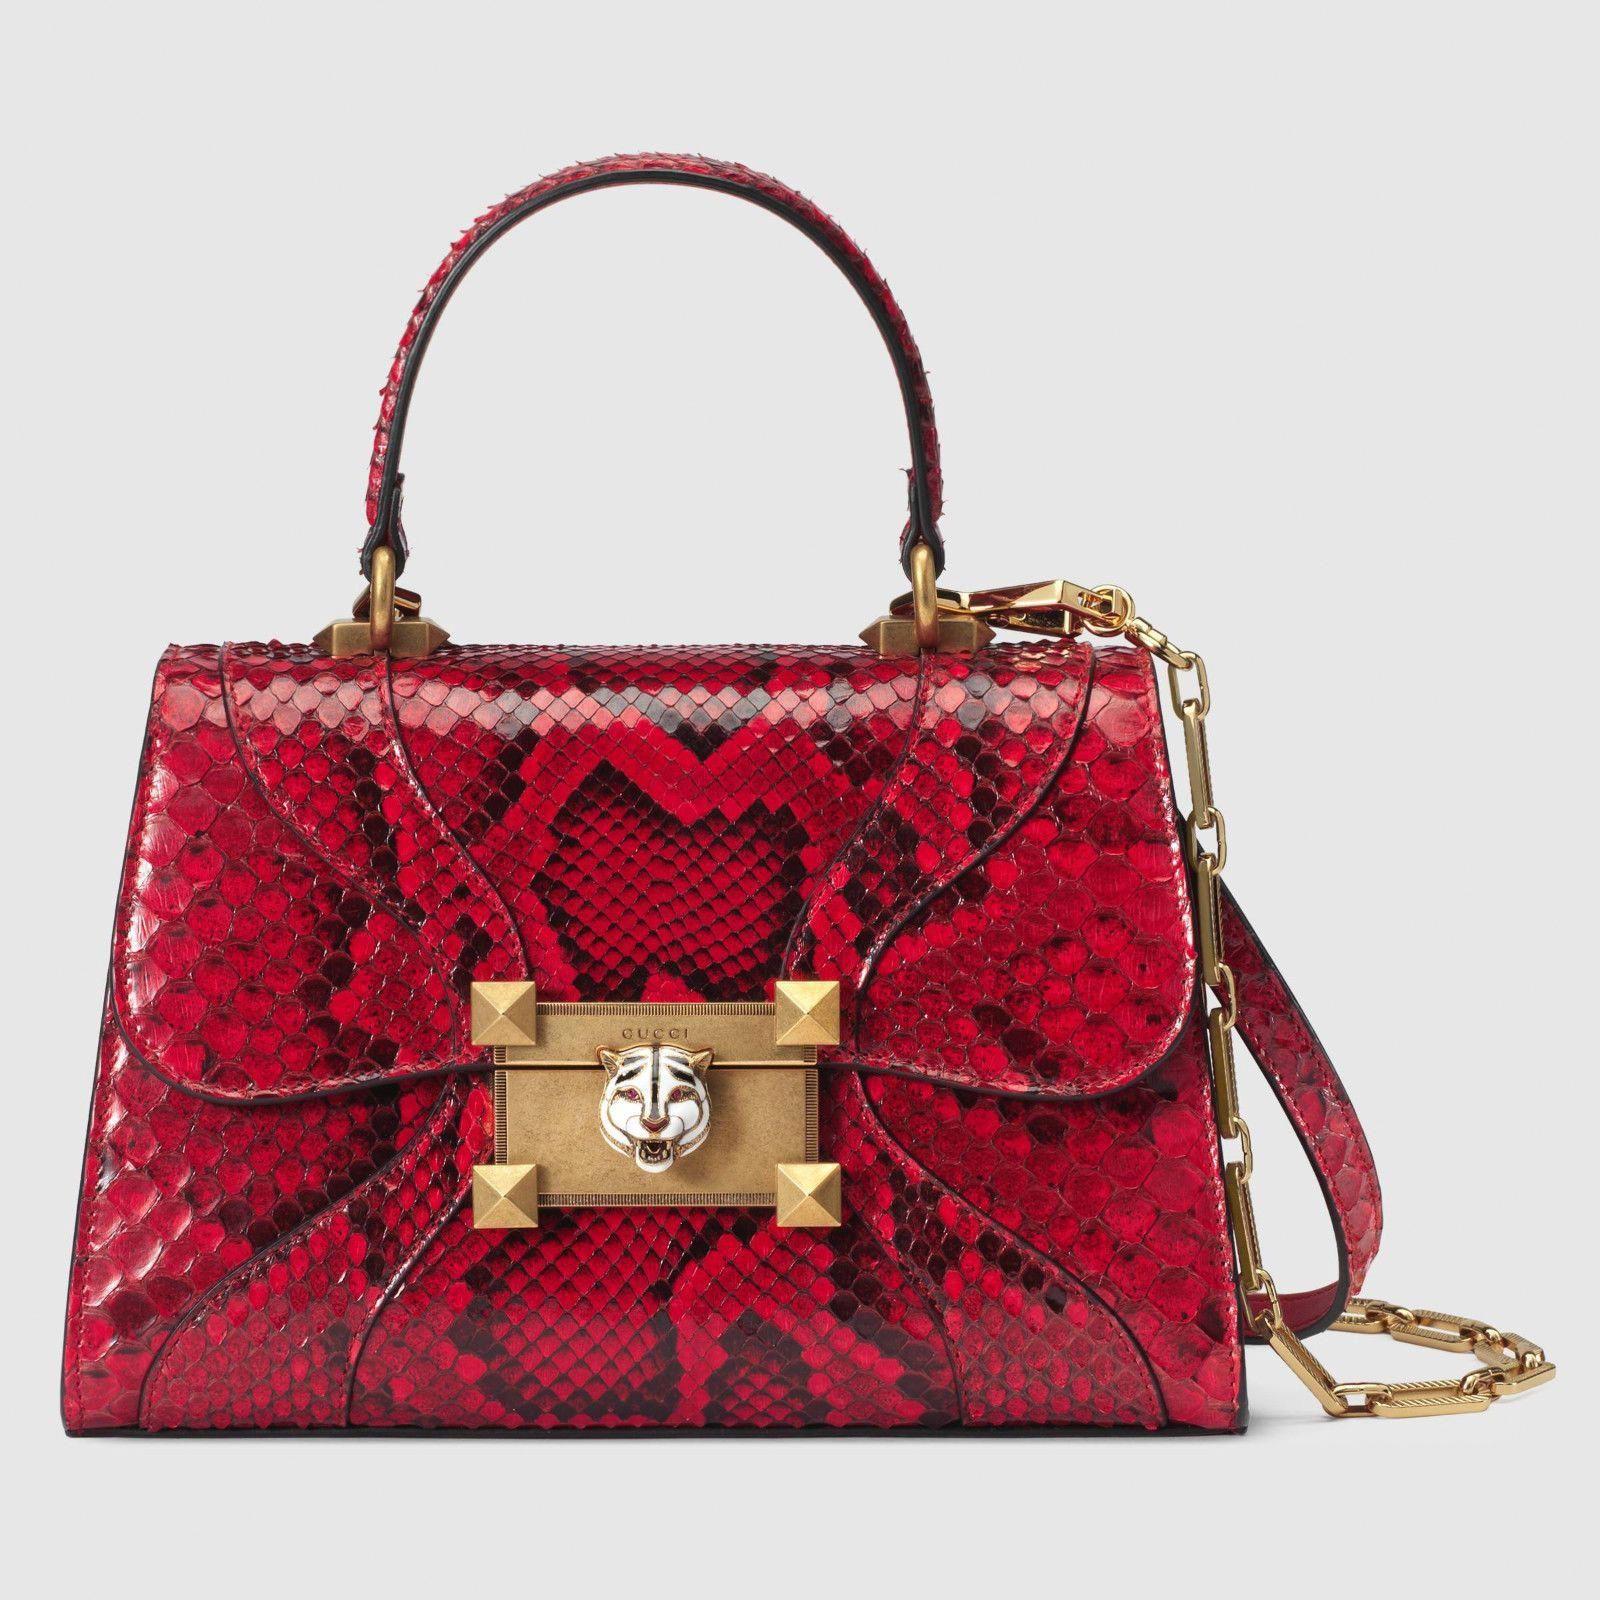 806d71fde4d 2018  Gucci Red Osiride Small Snakeskin Python Top-Handle Bag Purse Made In  Italy  Designerhandbags